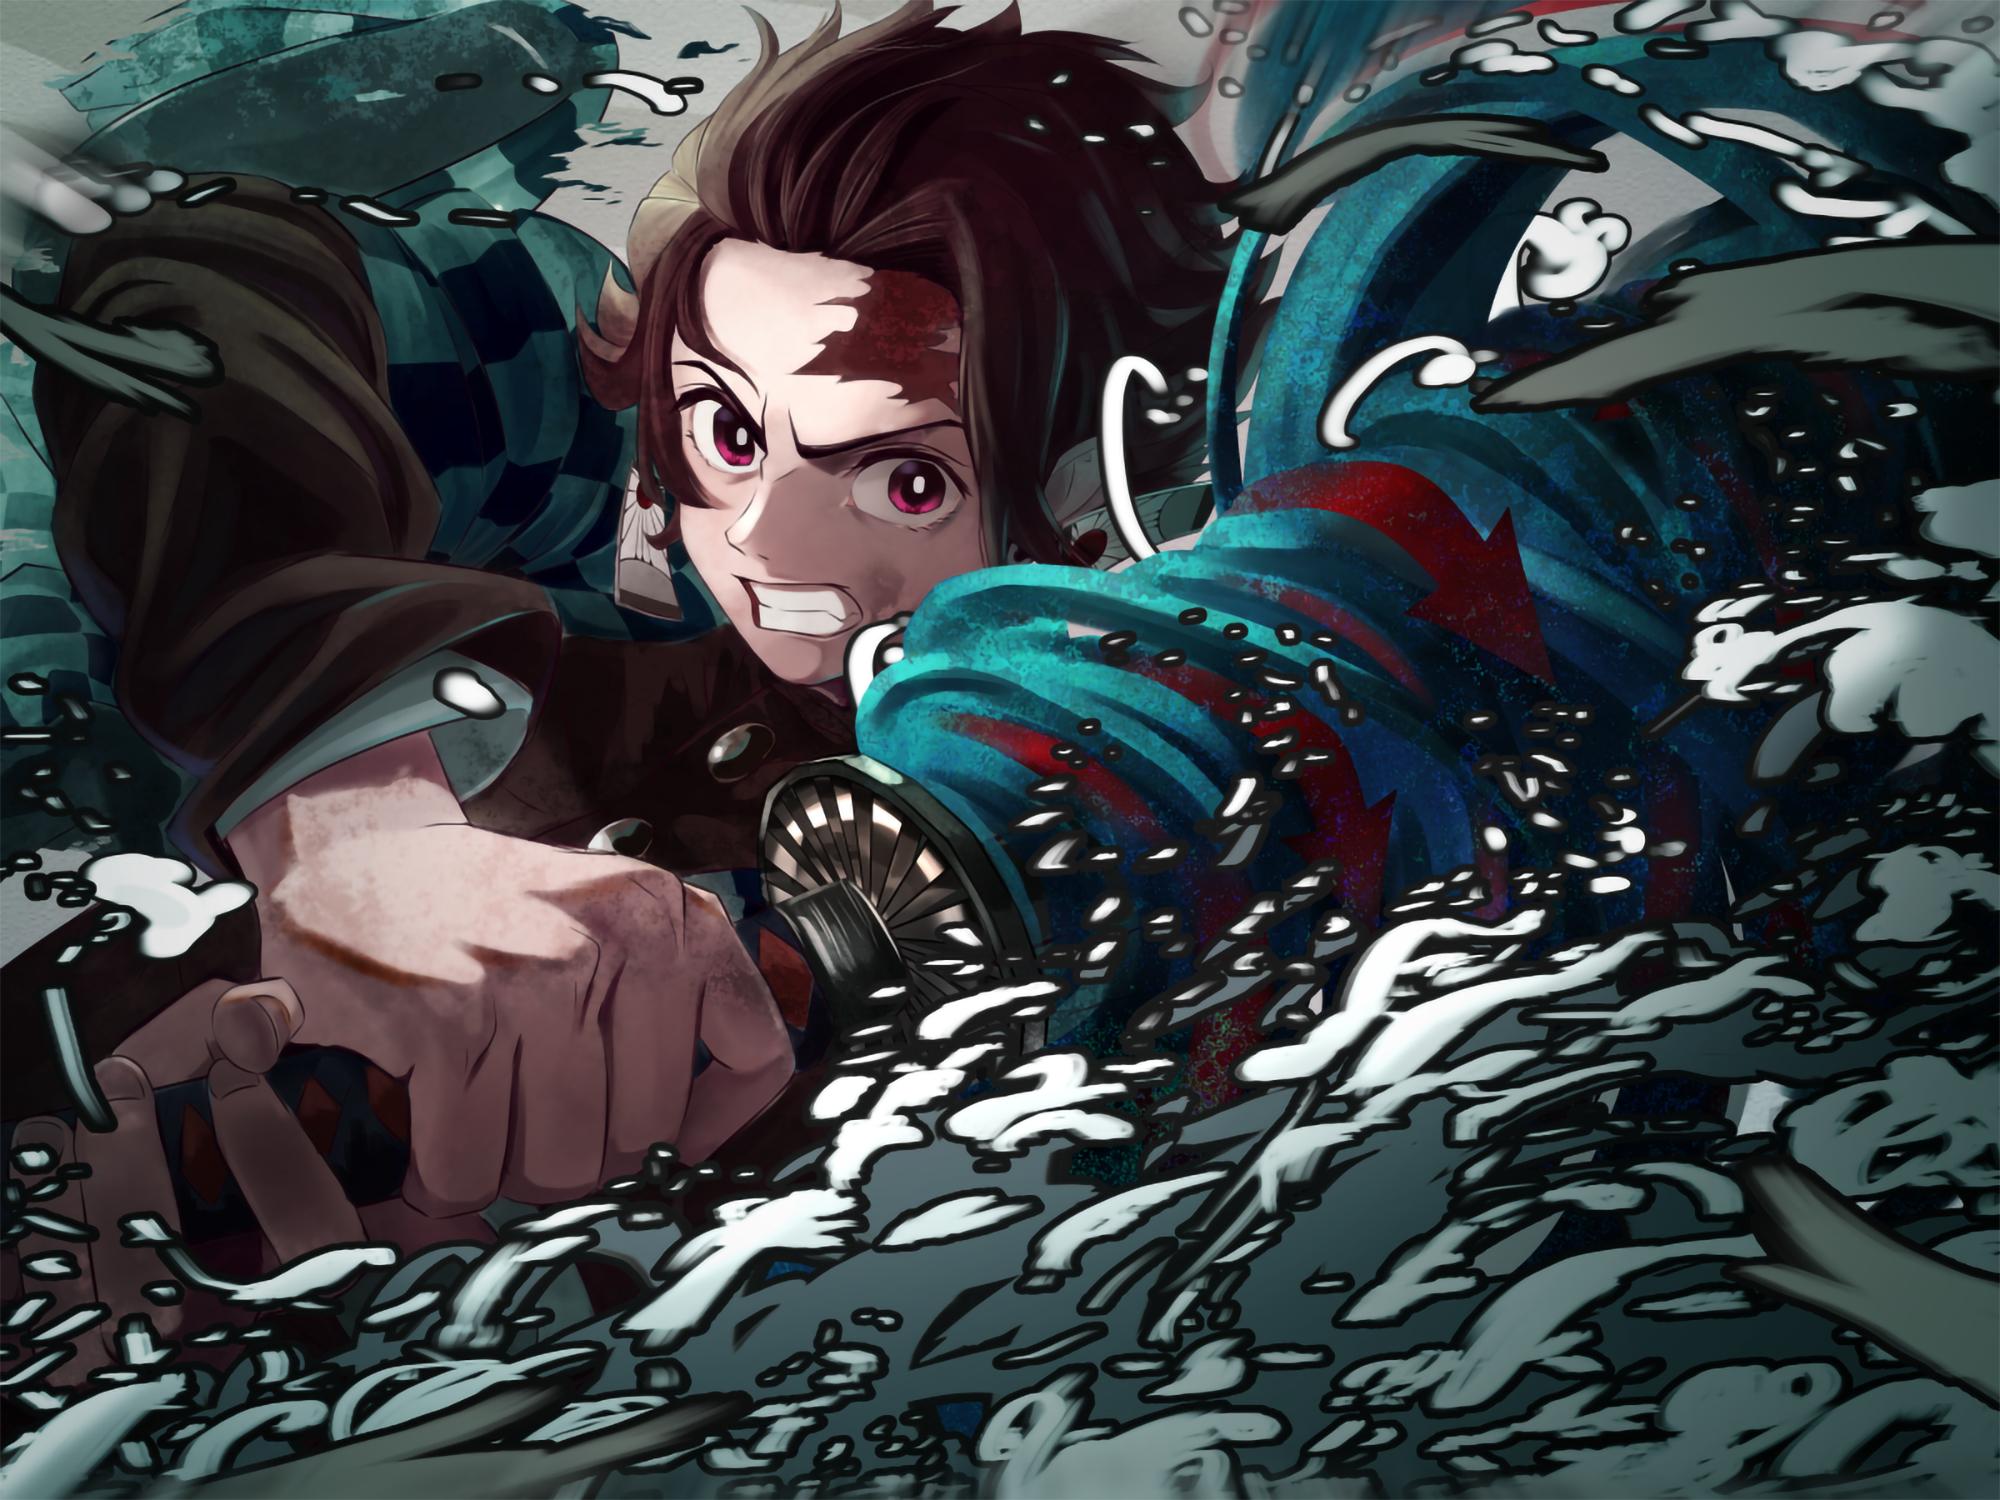 Tanjirou Kamado From Demon Slayer Wallpaper, HD Anime 4K ...